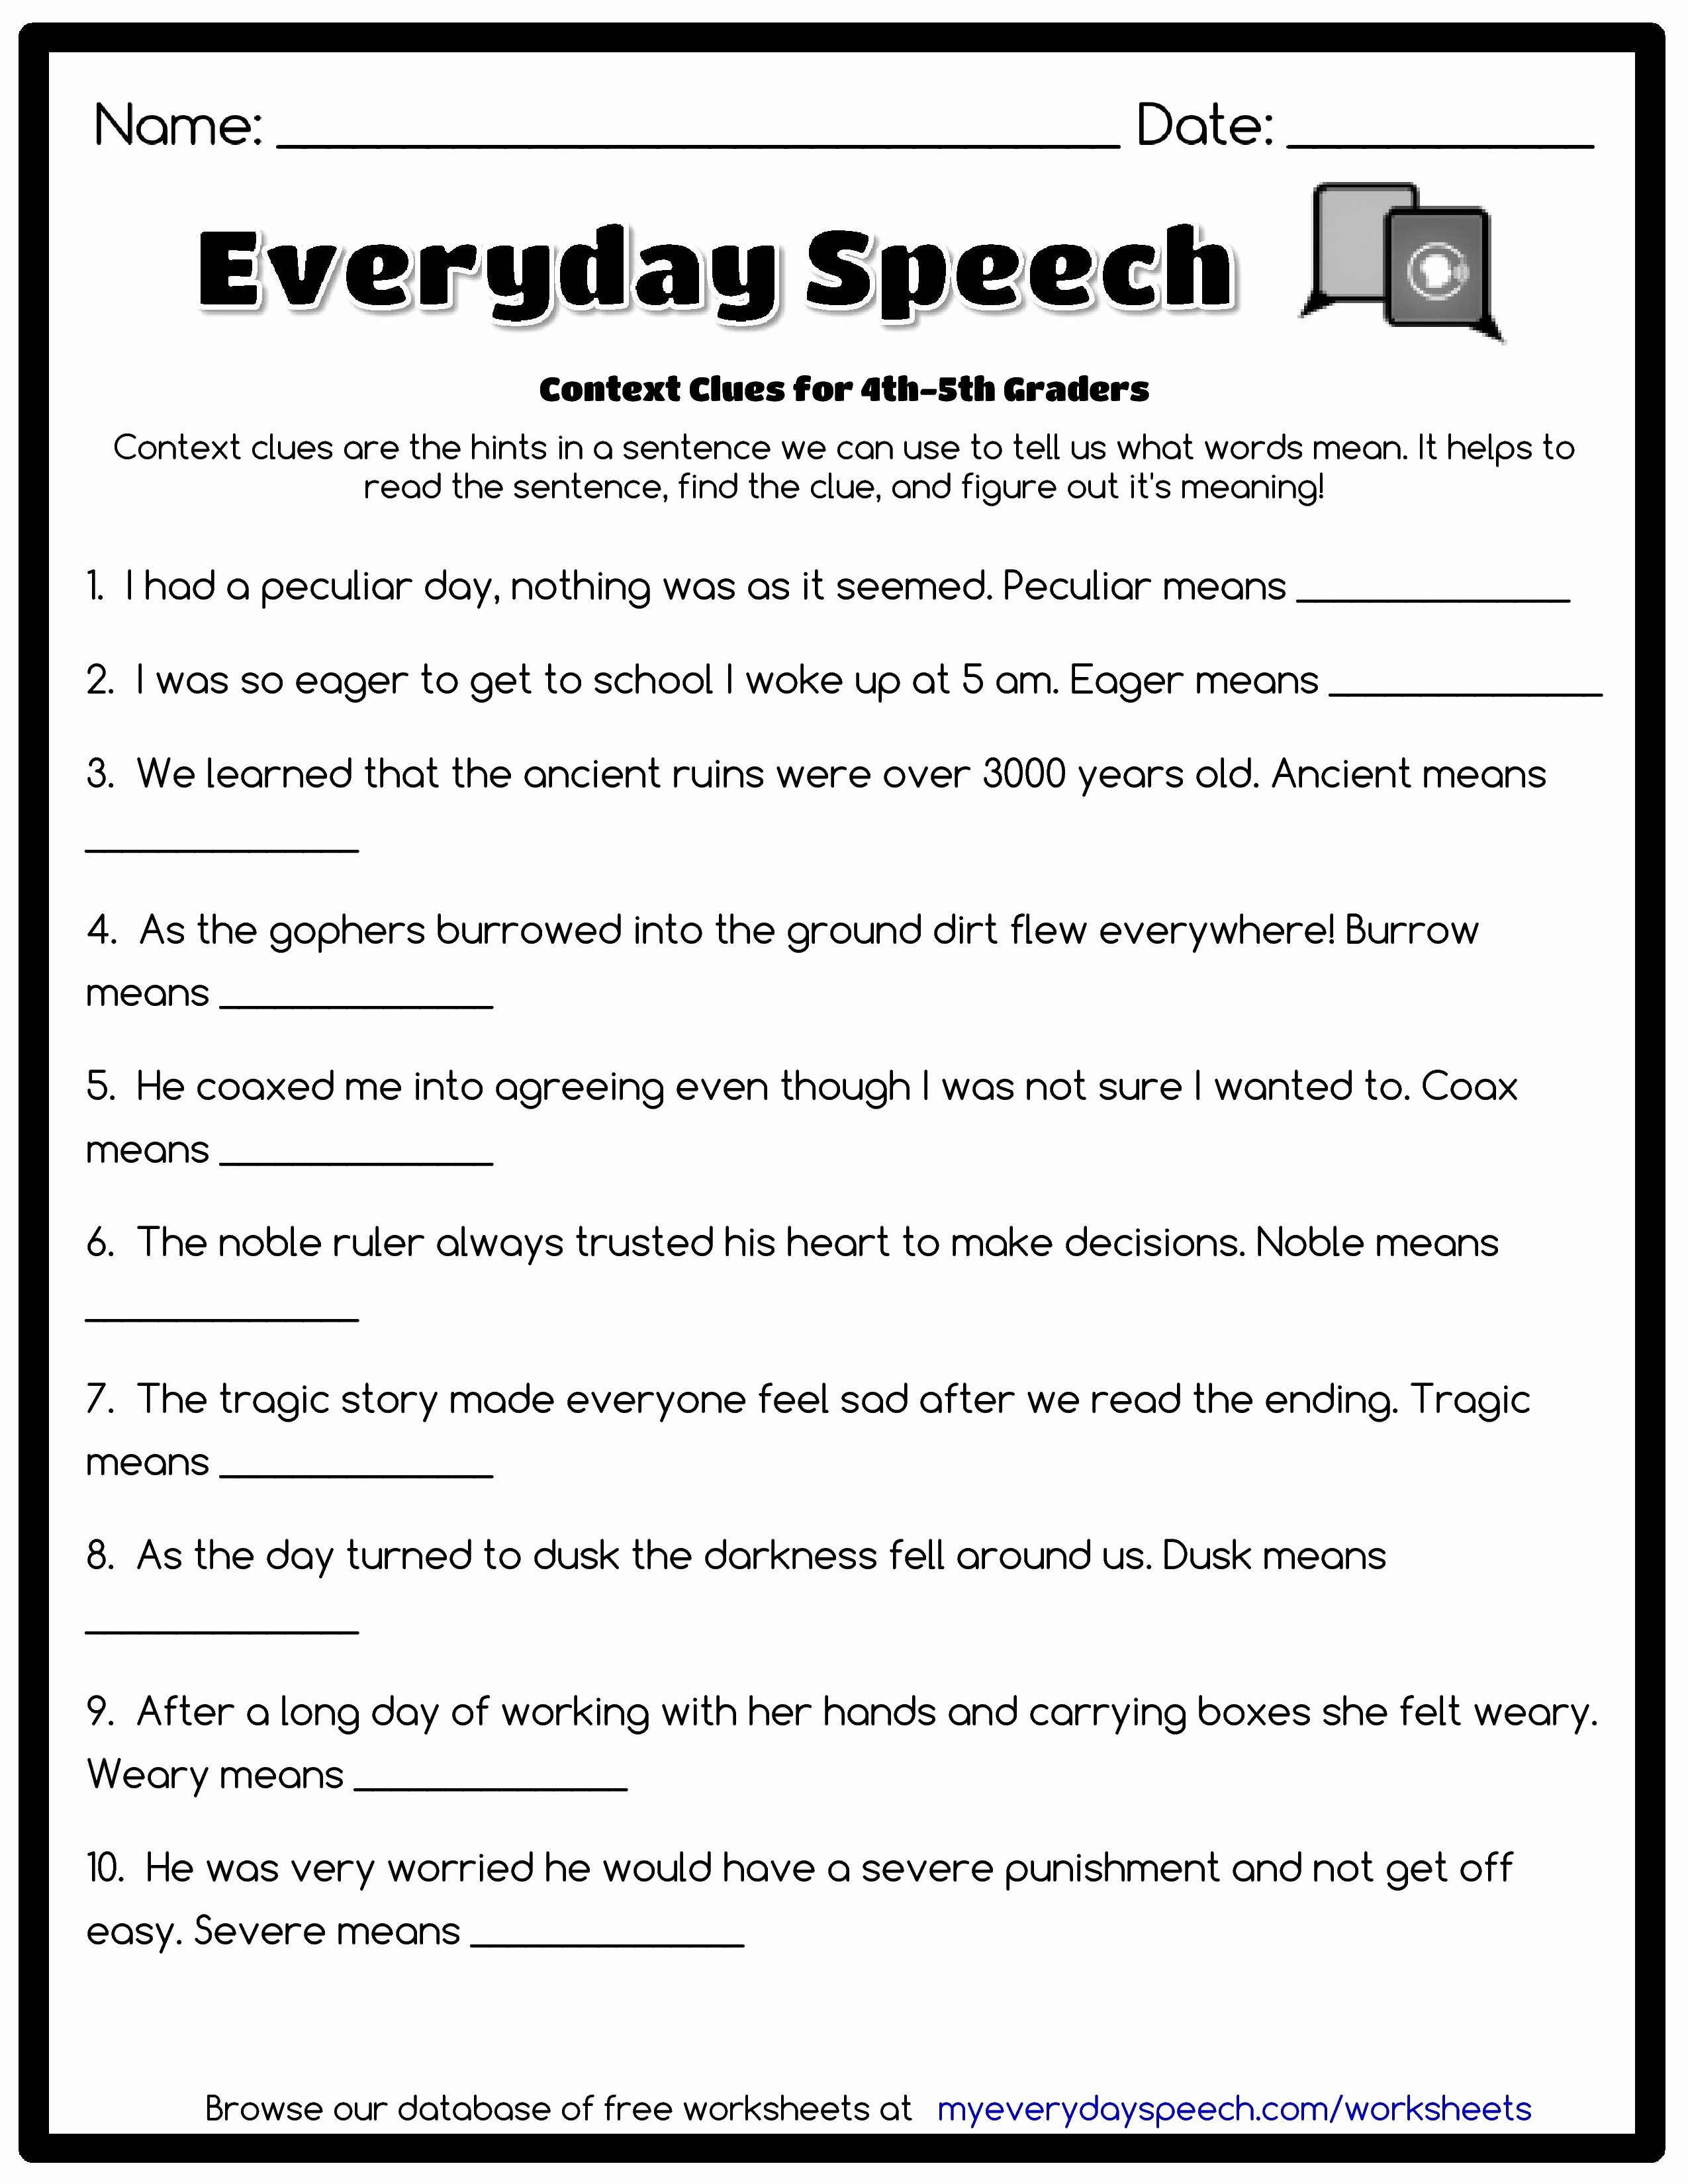 Grammar Worksheets Third Grade To Education - Math Worksheet For   Free Printable Third Grade Grammar Worksheets